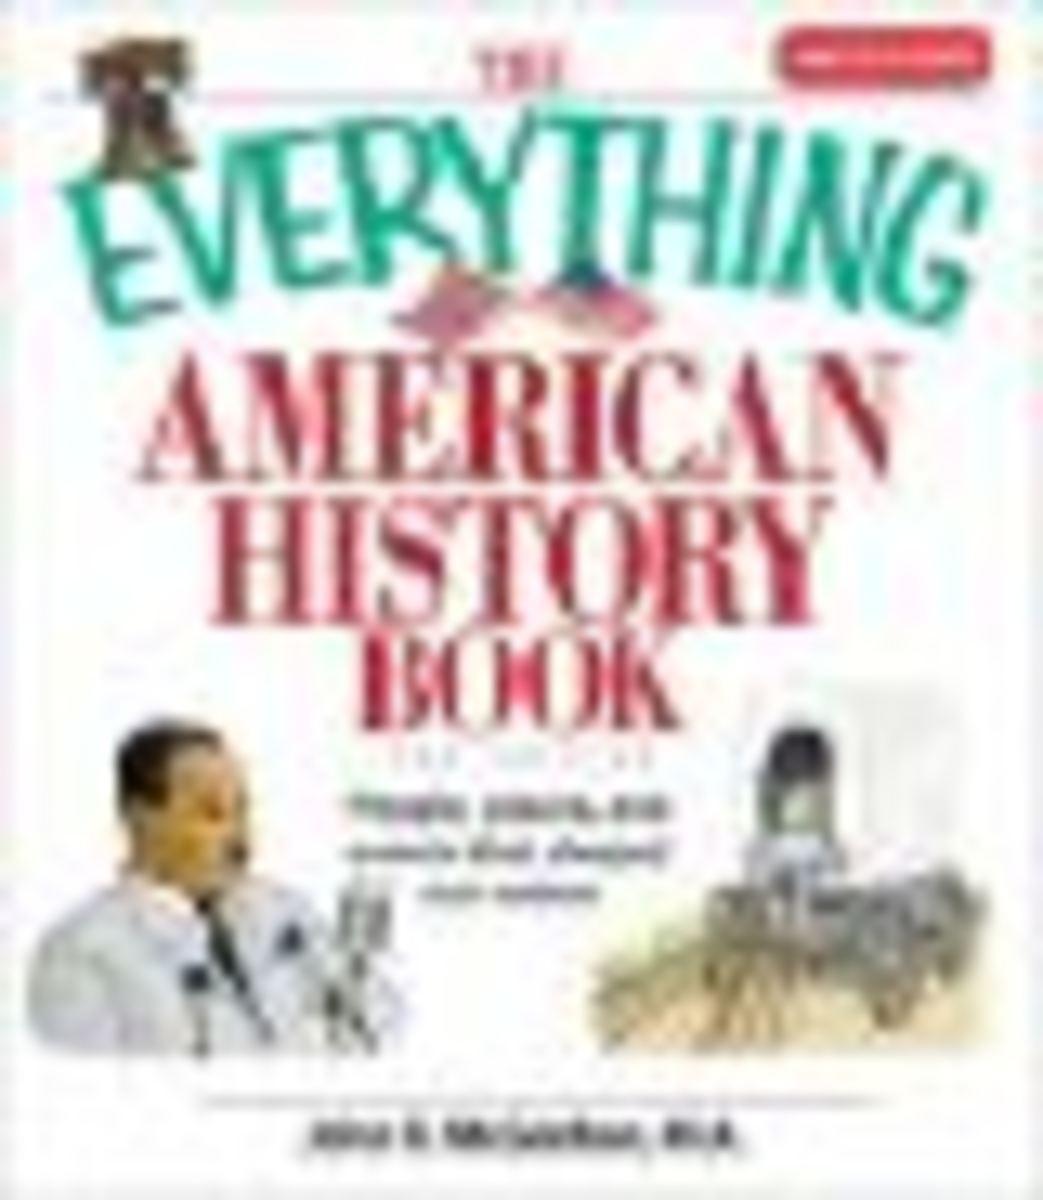 everythingamericanhistory.jpg